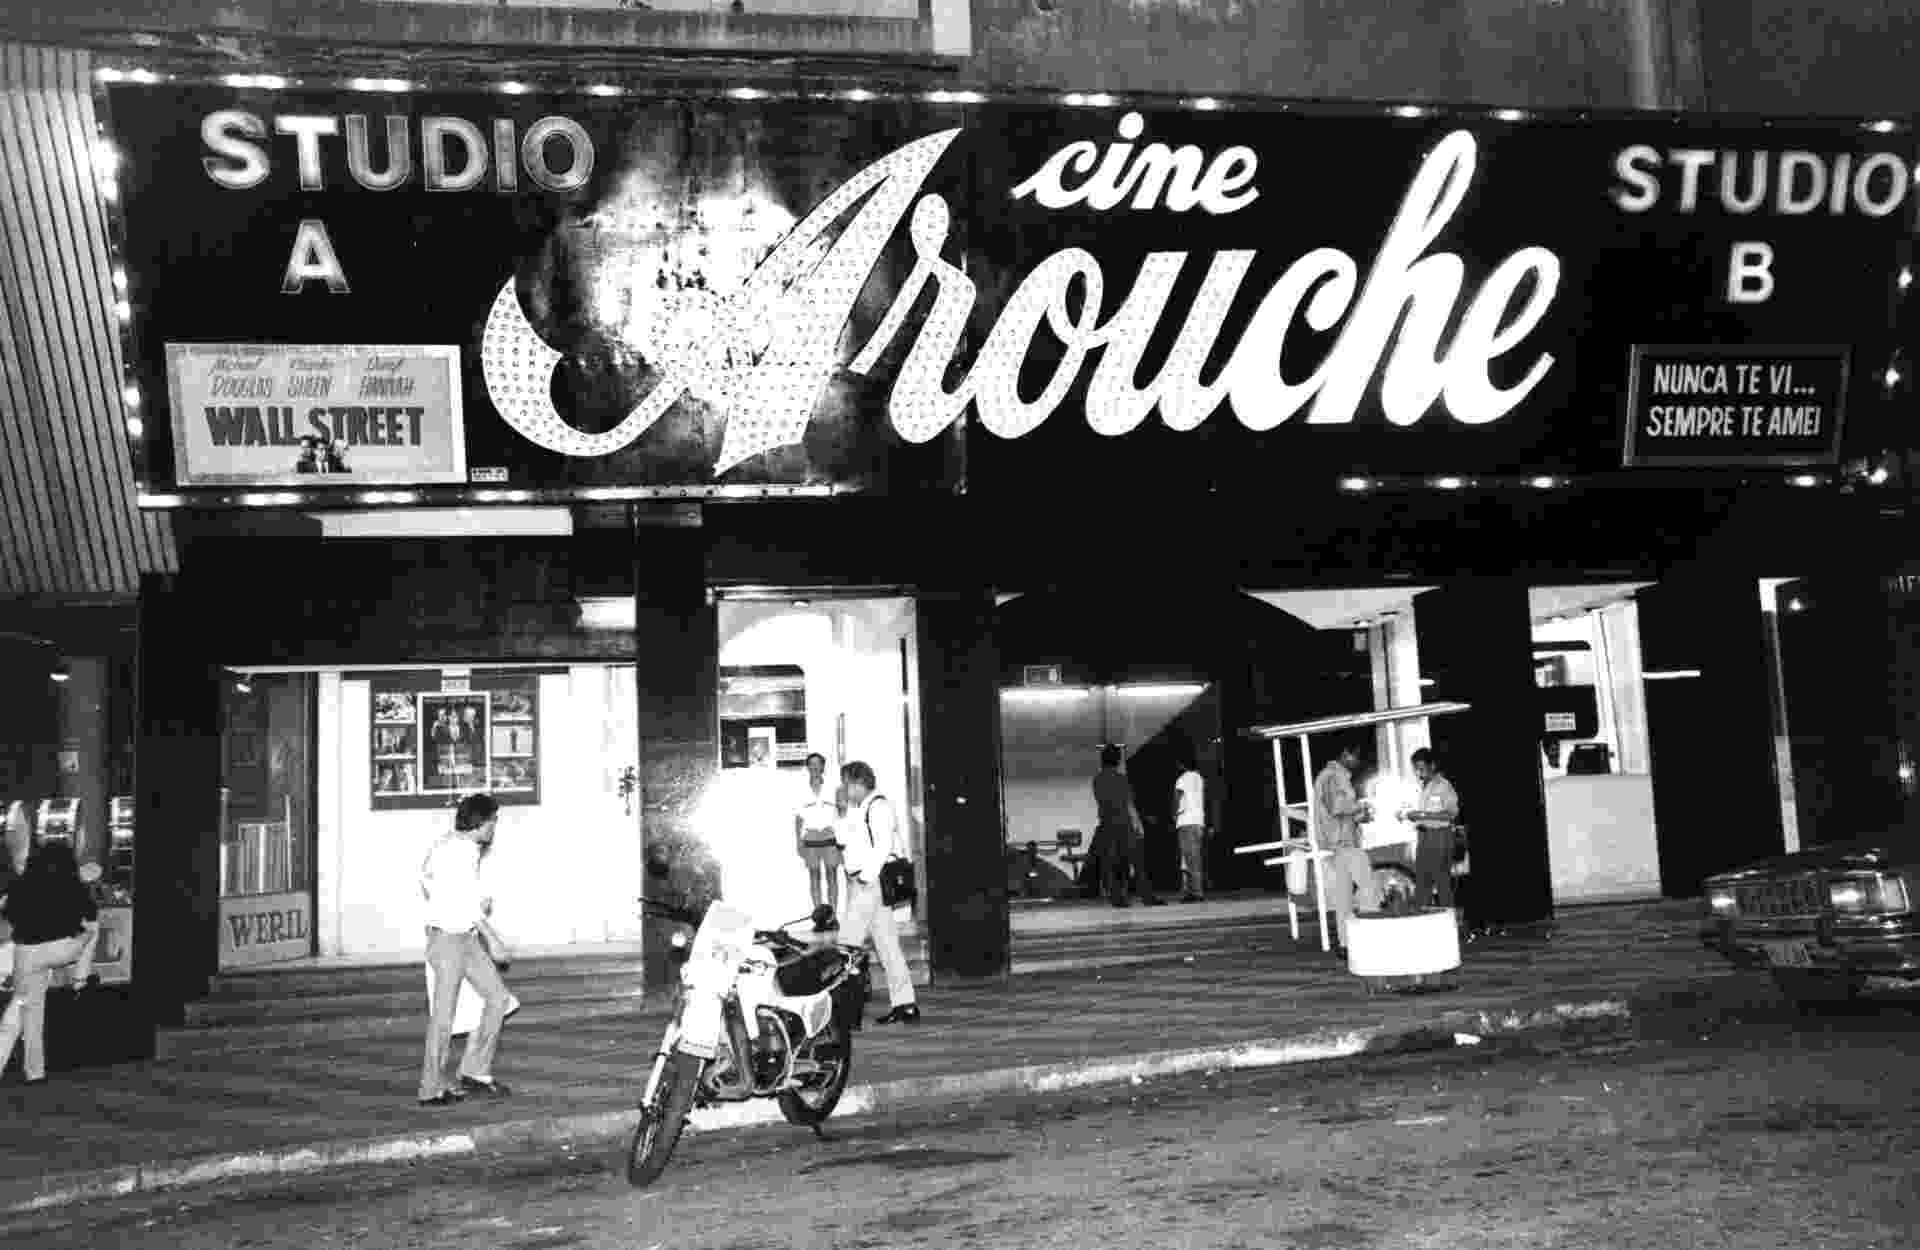 Cinema Cine Arouche em 1988 - Cinema Cine Arouche em 1988